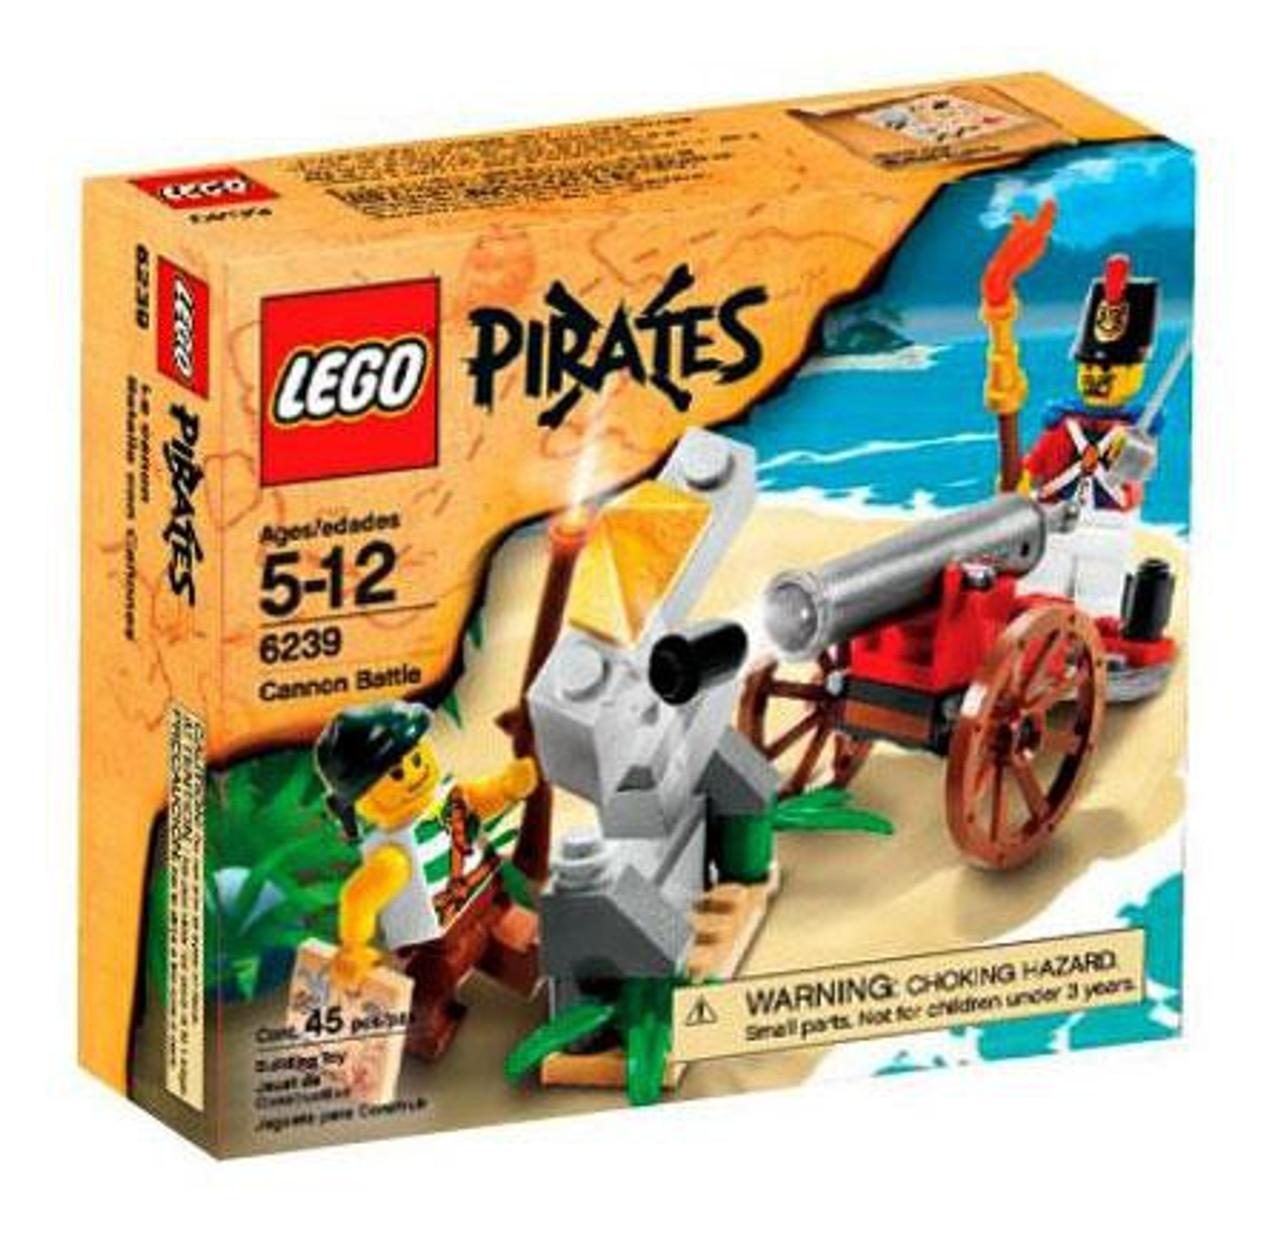 LEGO Pirates Cannon Battle Set #6239